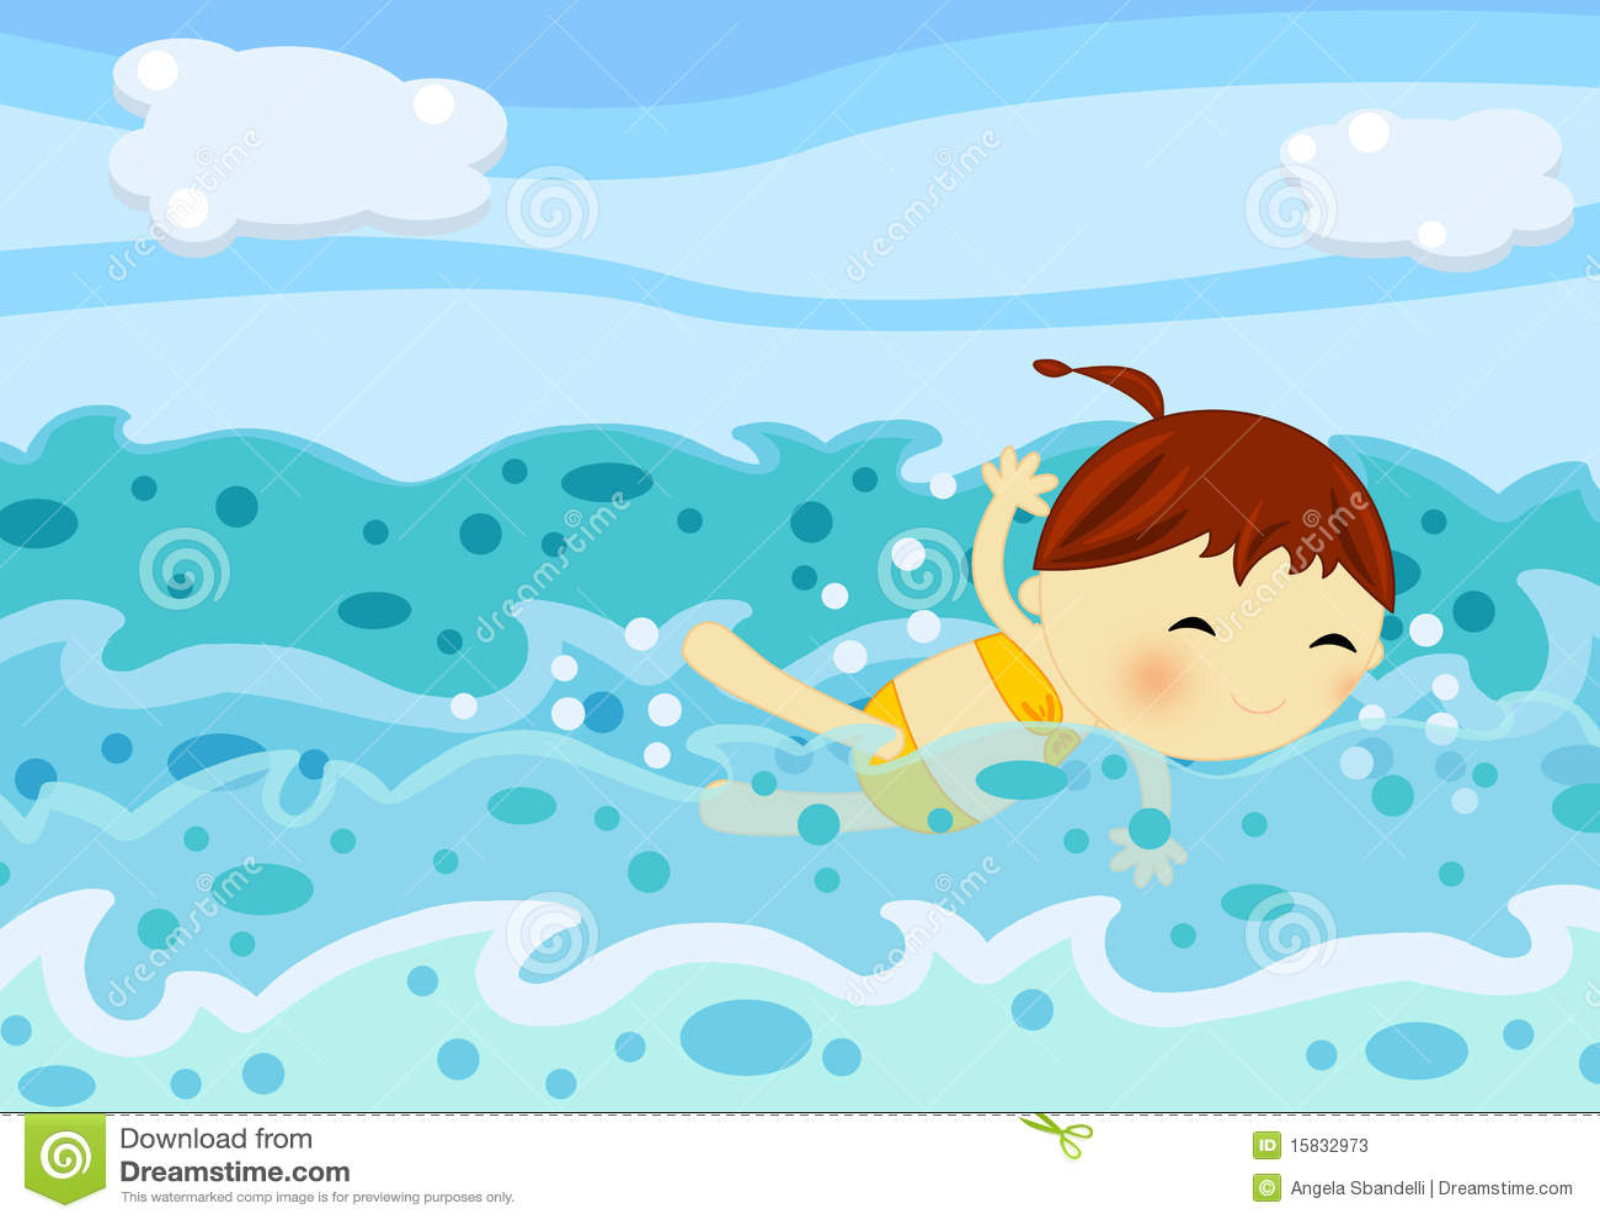 cute little girl swimming among the sea waves stock illustration rh dreamstime com Ocean Wave Clip Art Simple Wave Clip Art